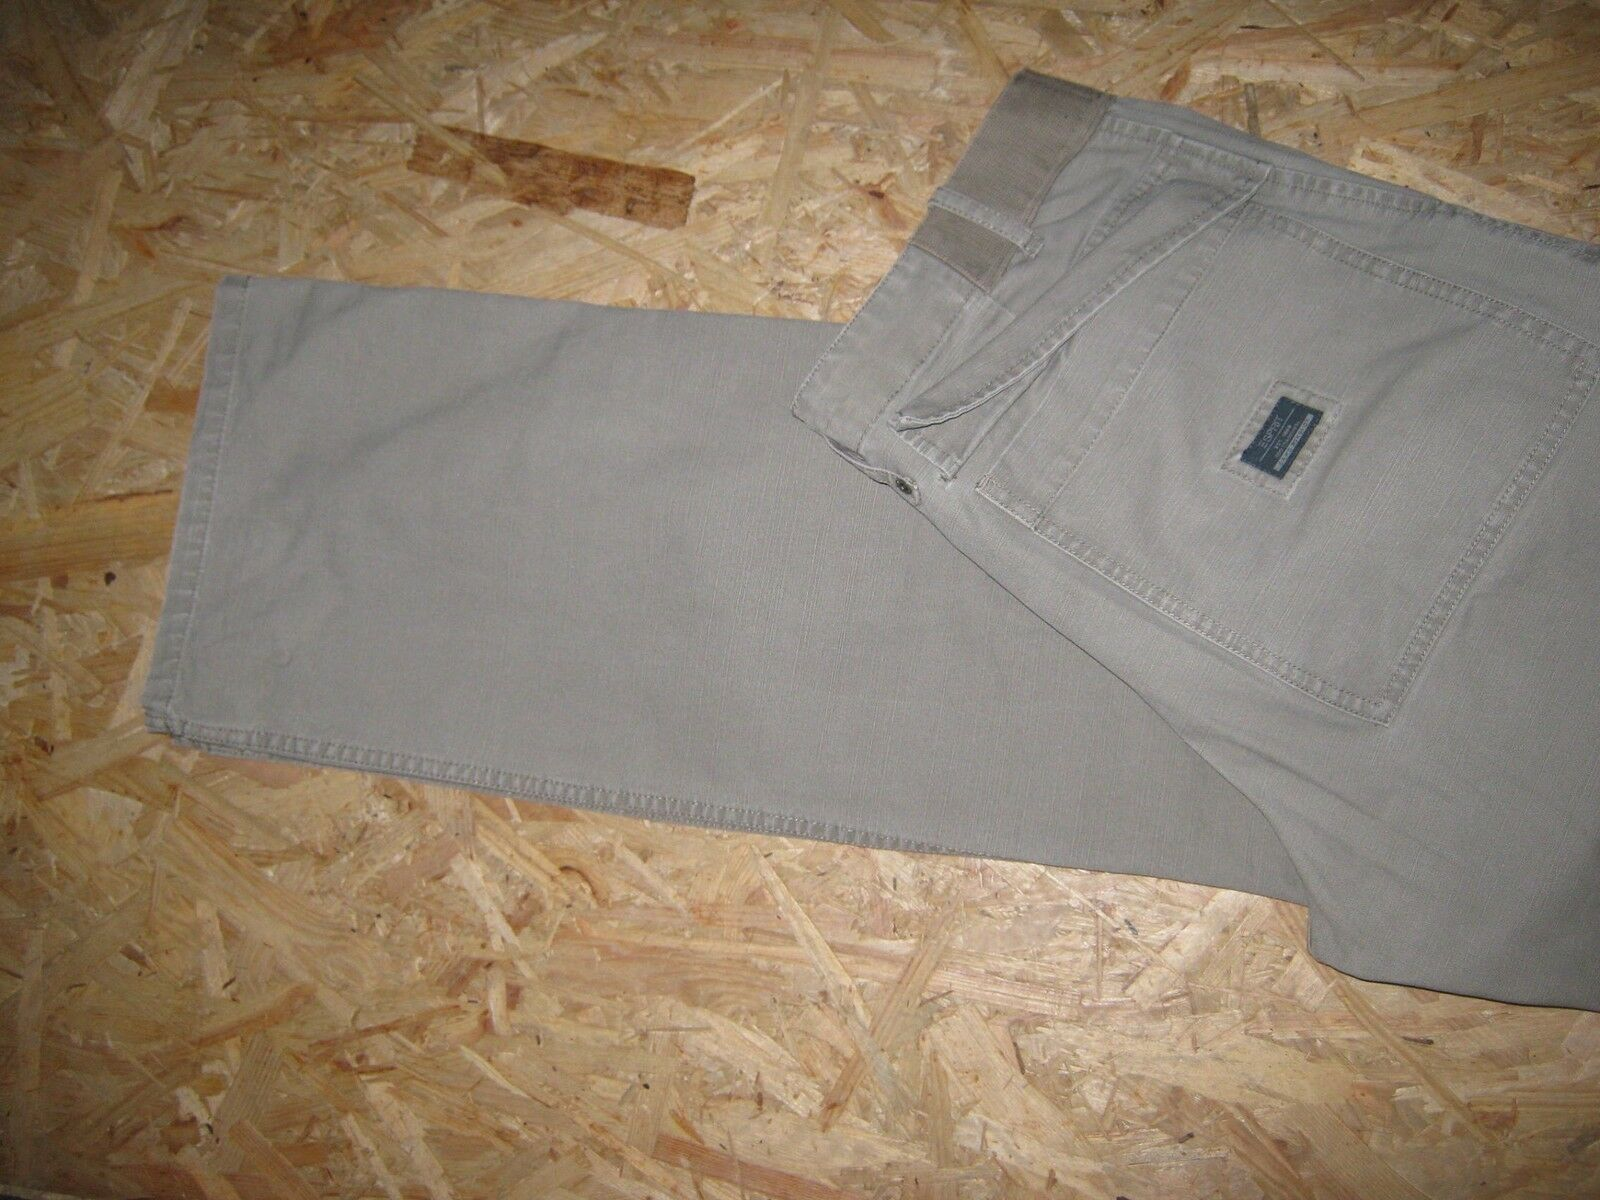 Sportl. Cargo Jeans V. Beige Esprit Taille w32/l34 Beige V. Top! 4de479